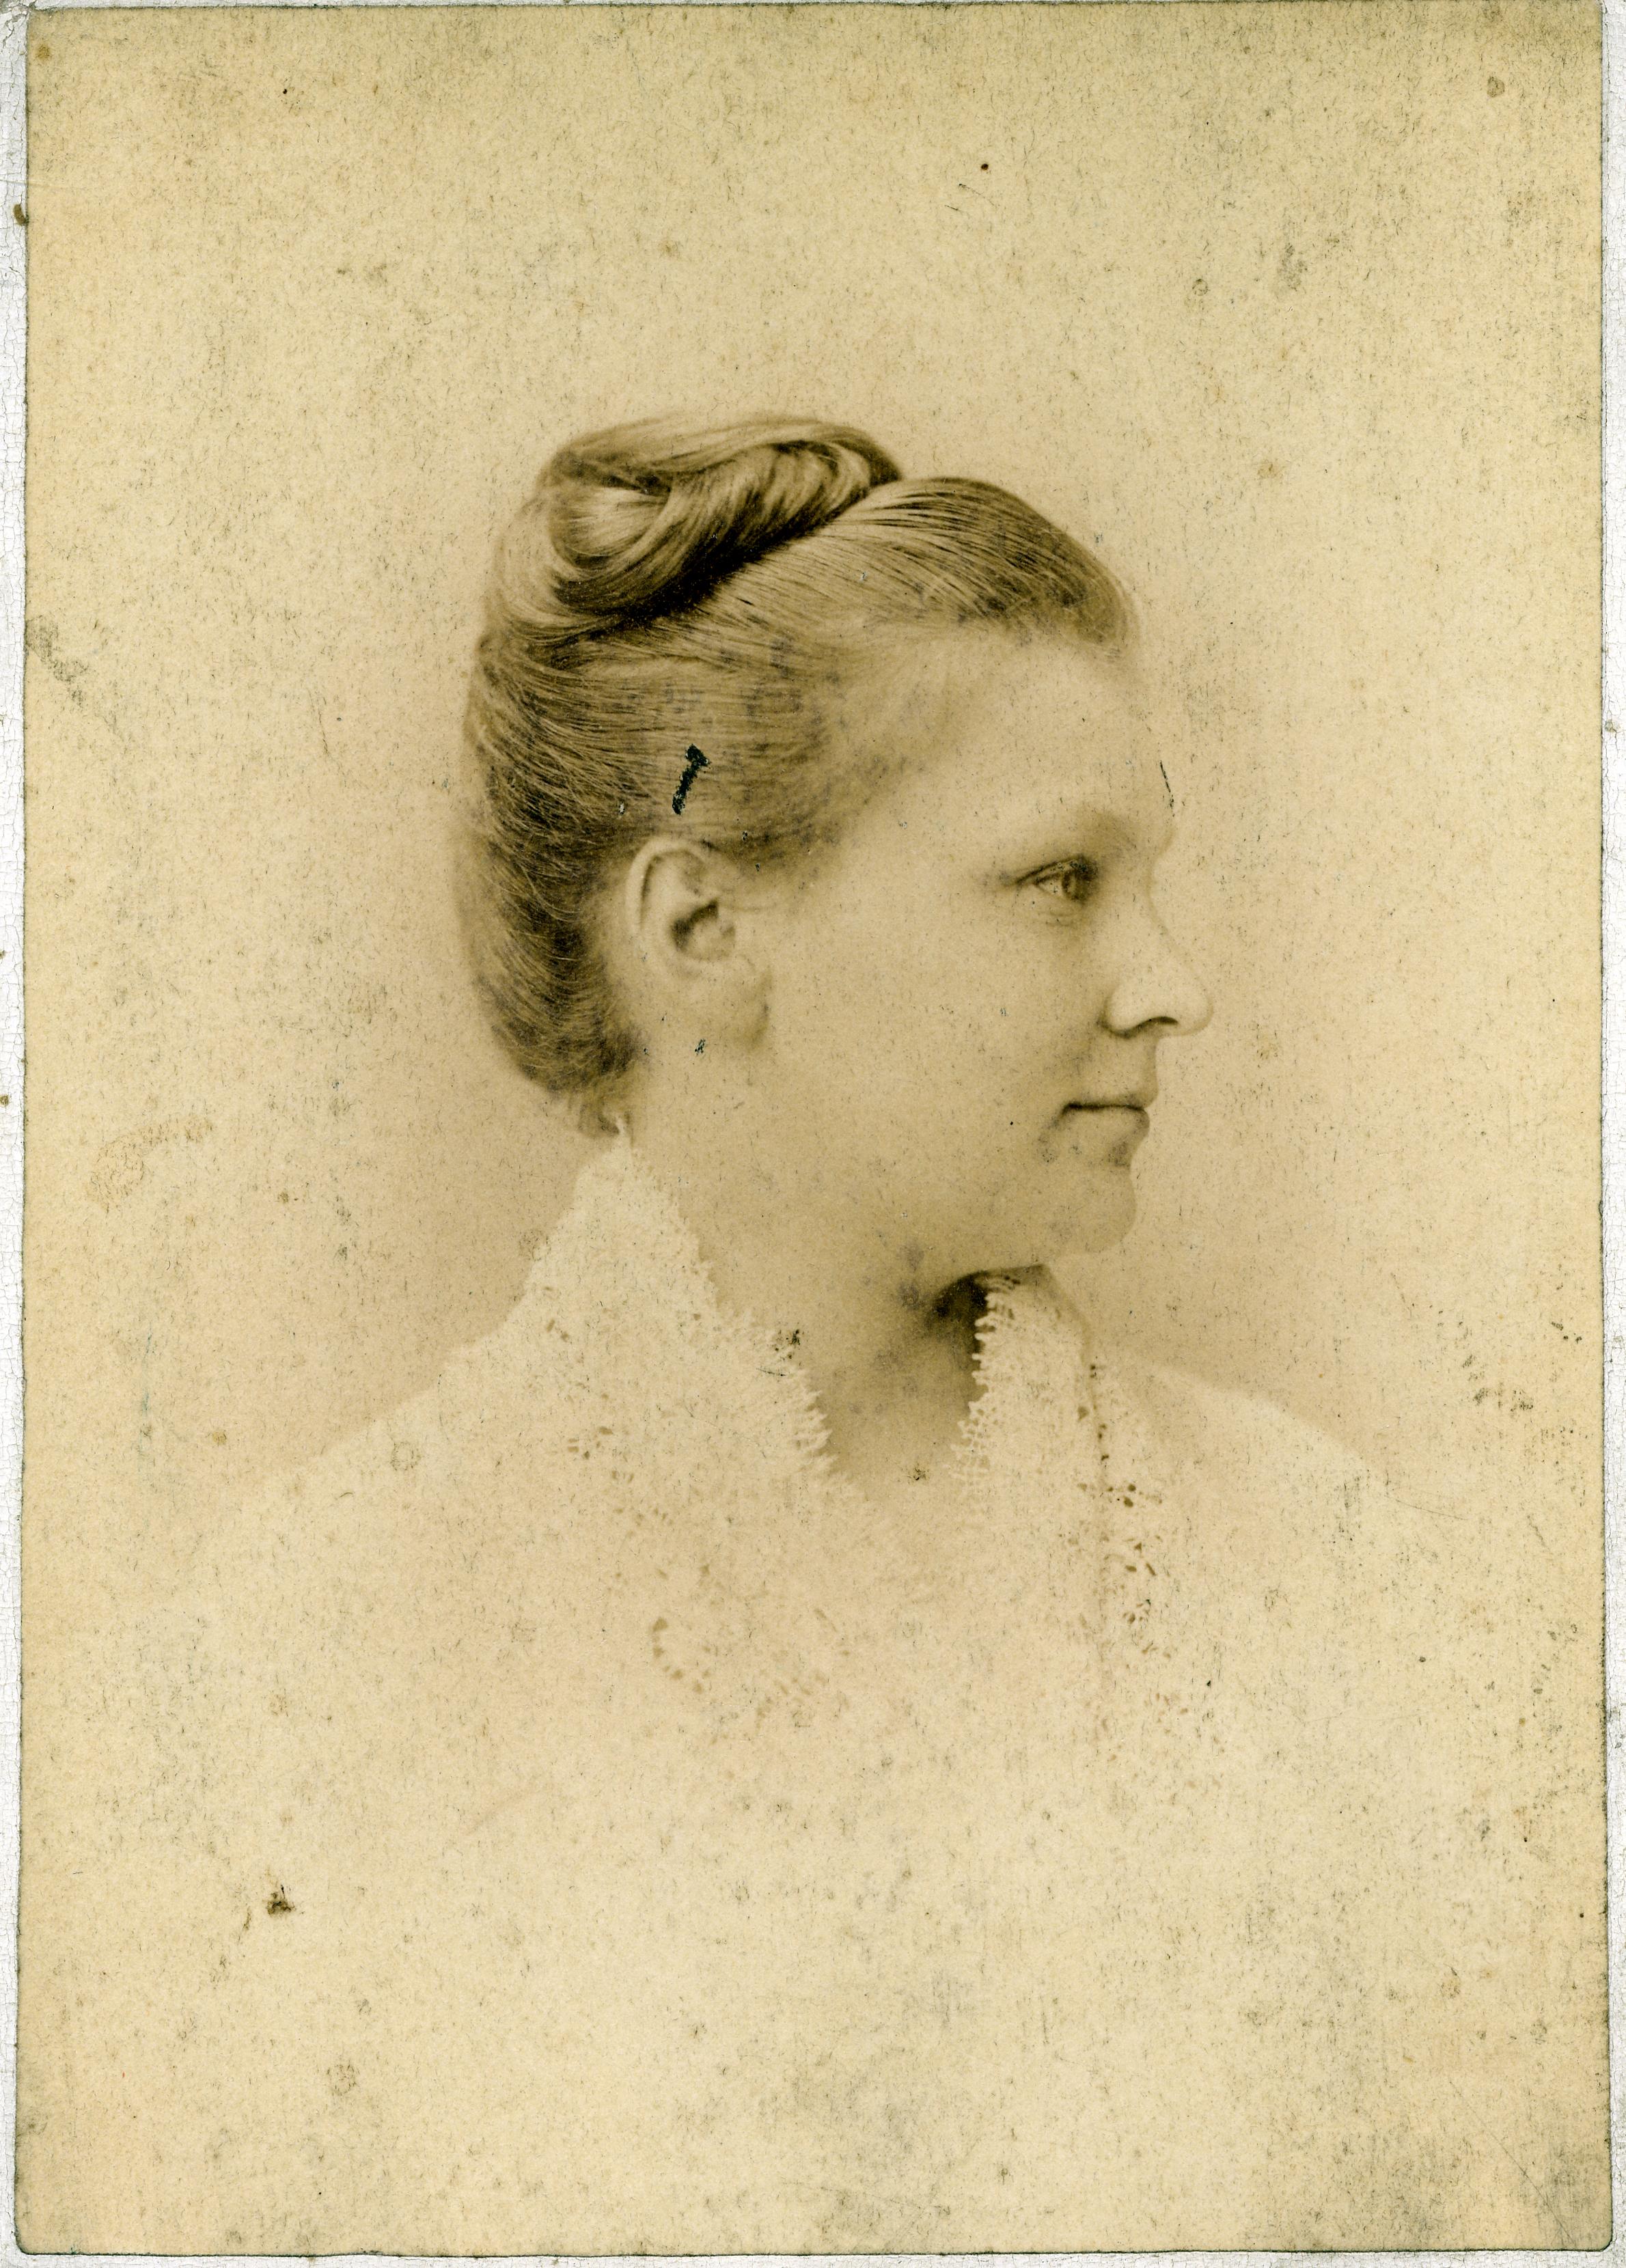 PPH-Ruth Huntington formal portrait 2-Bx 136.jpg